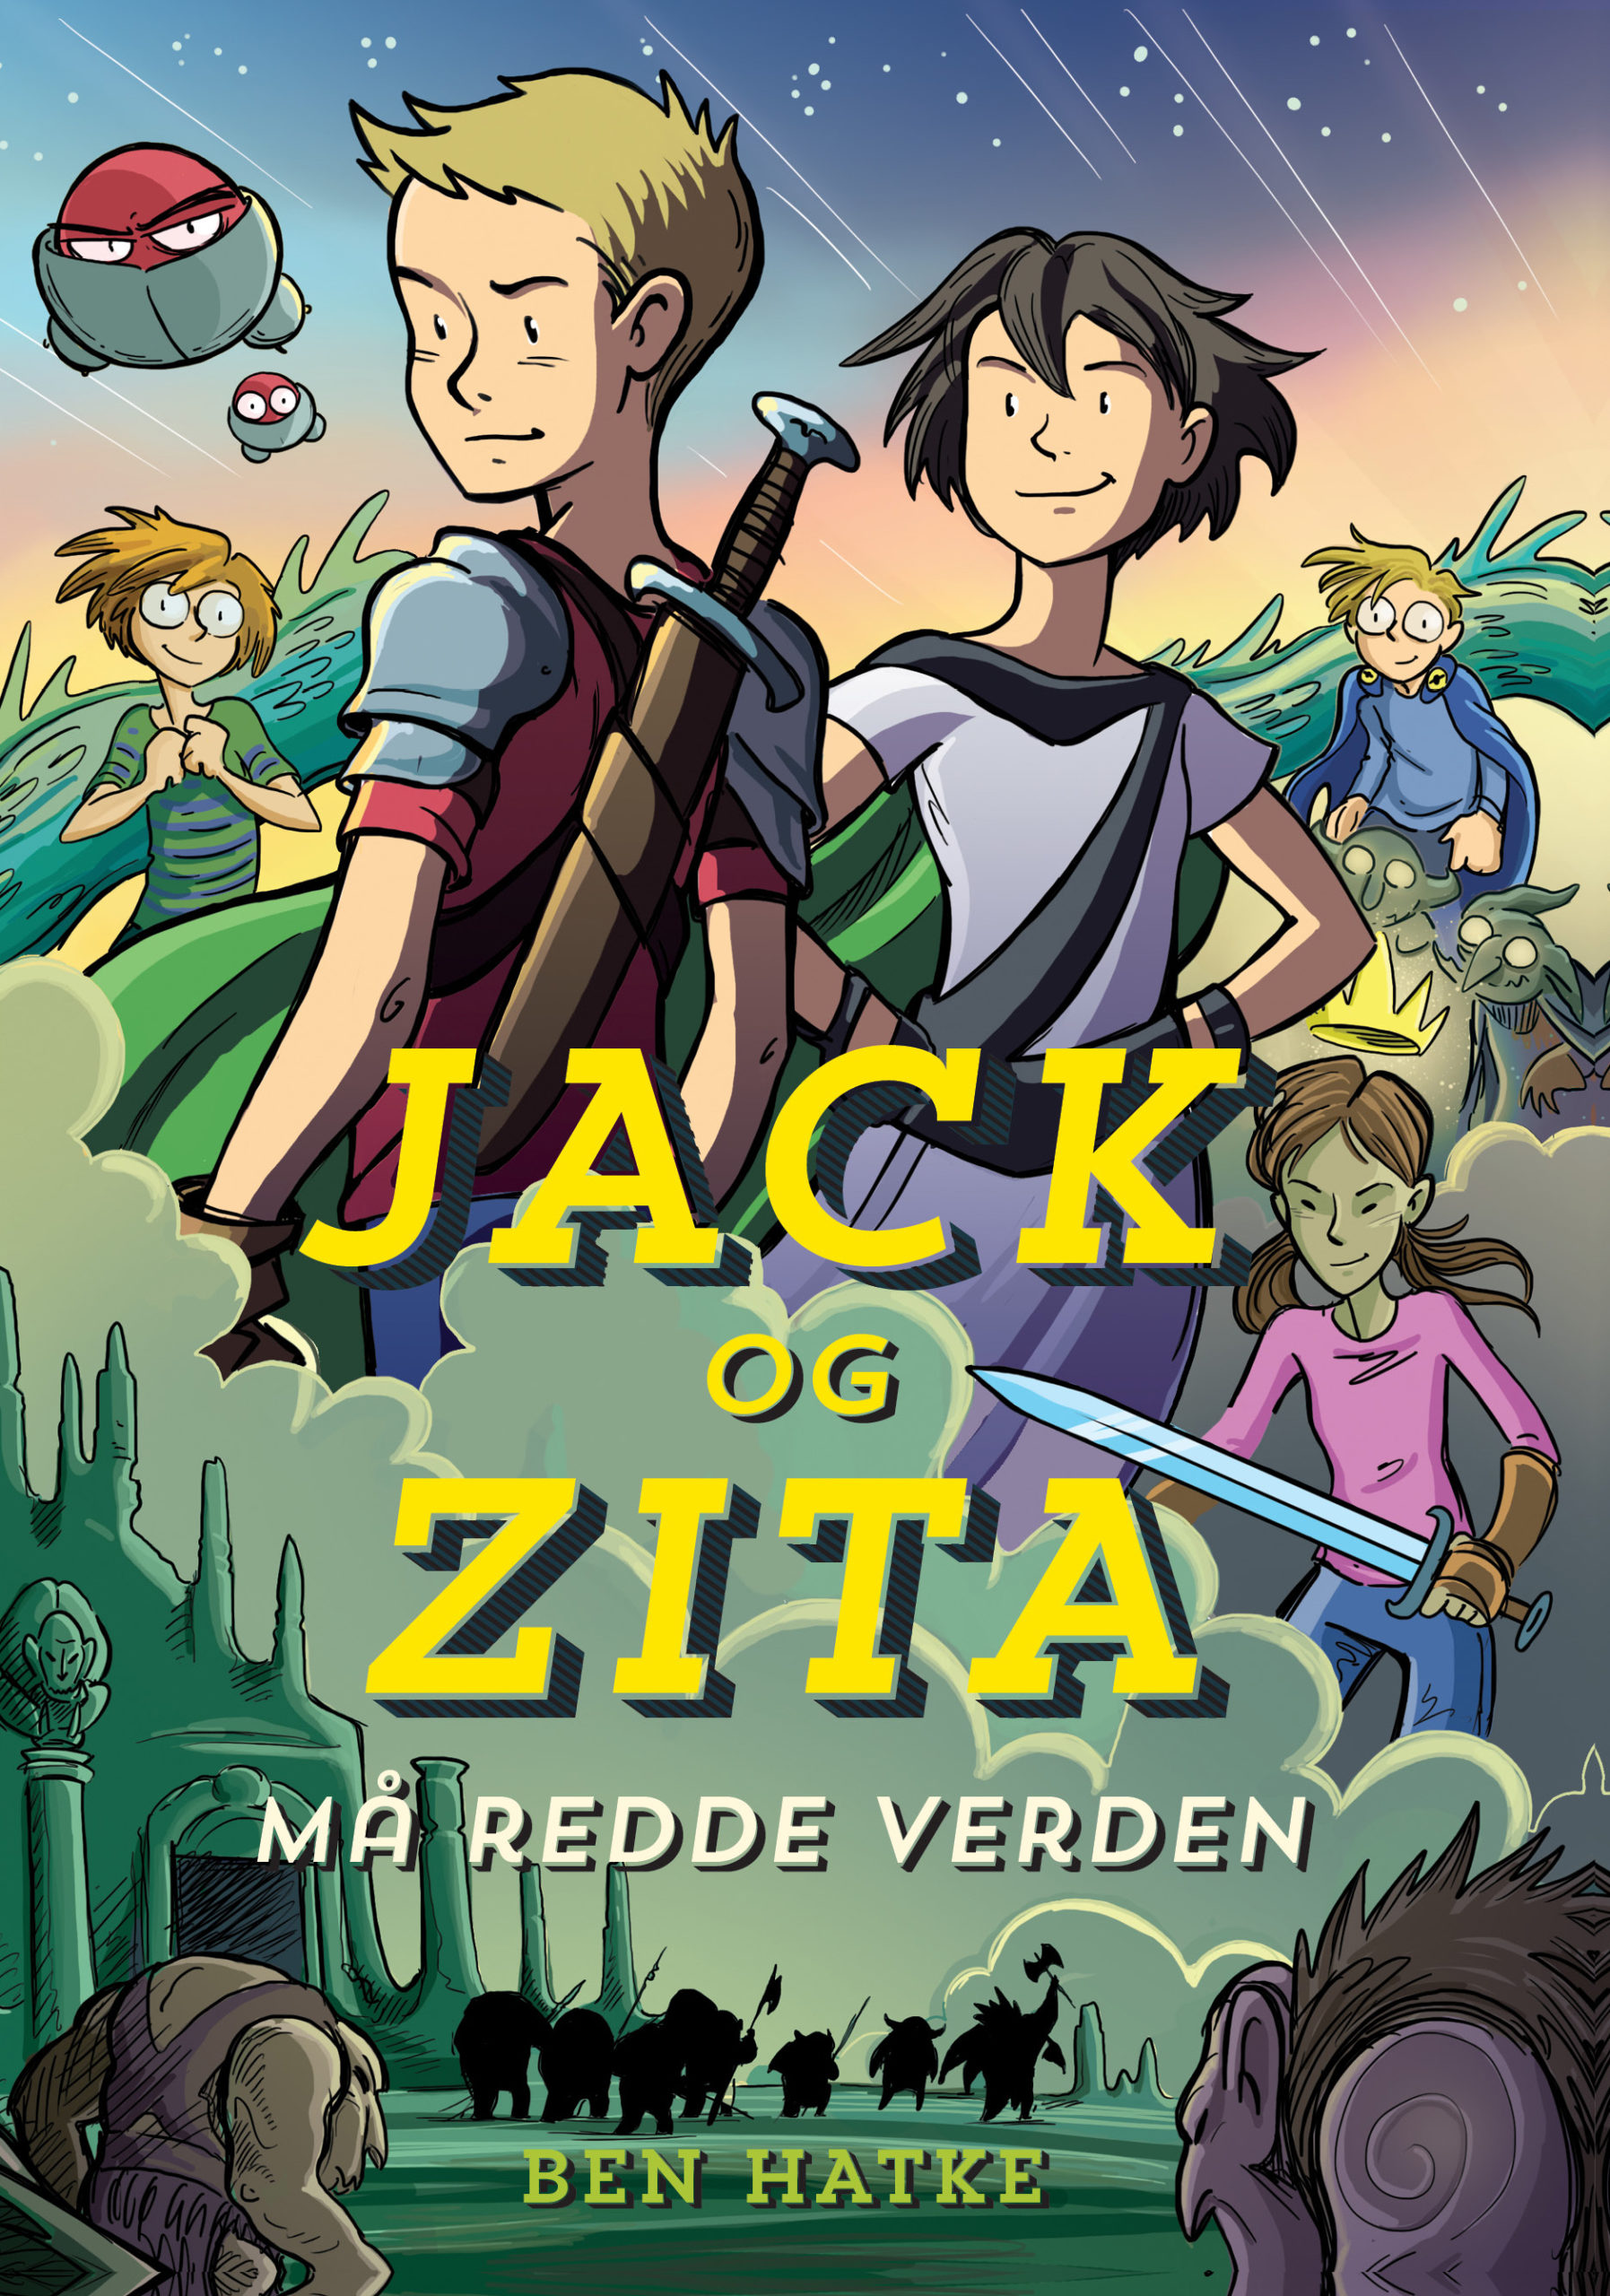 Jack og Zita redder verden forside